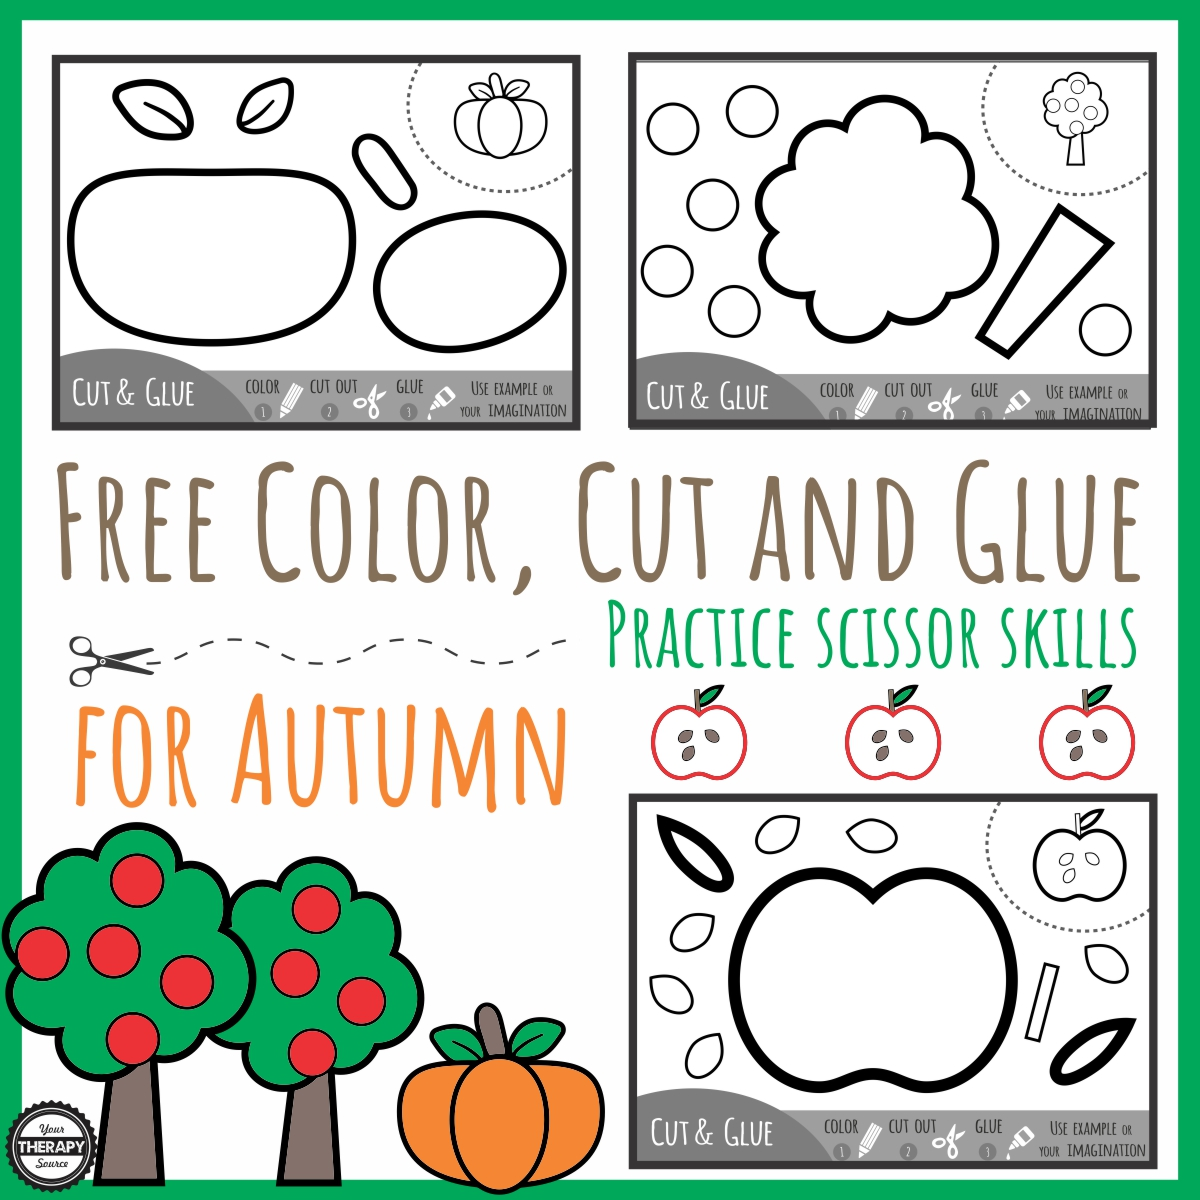 Color Cut Glue Scissor Practice For Fall